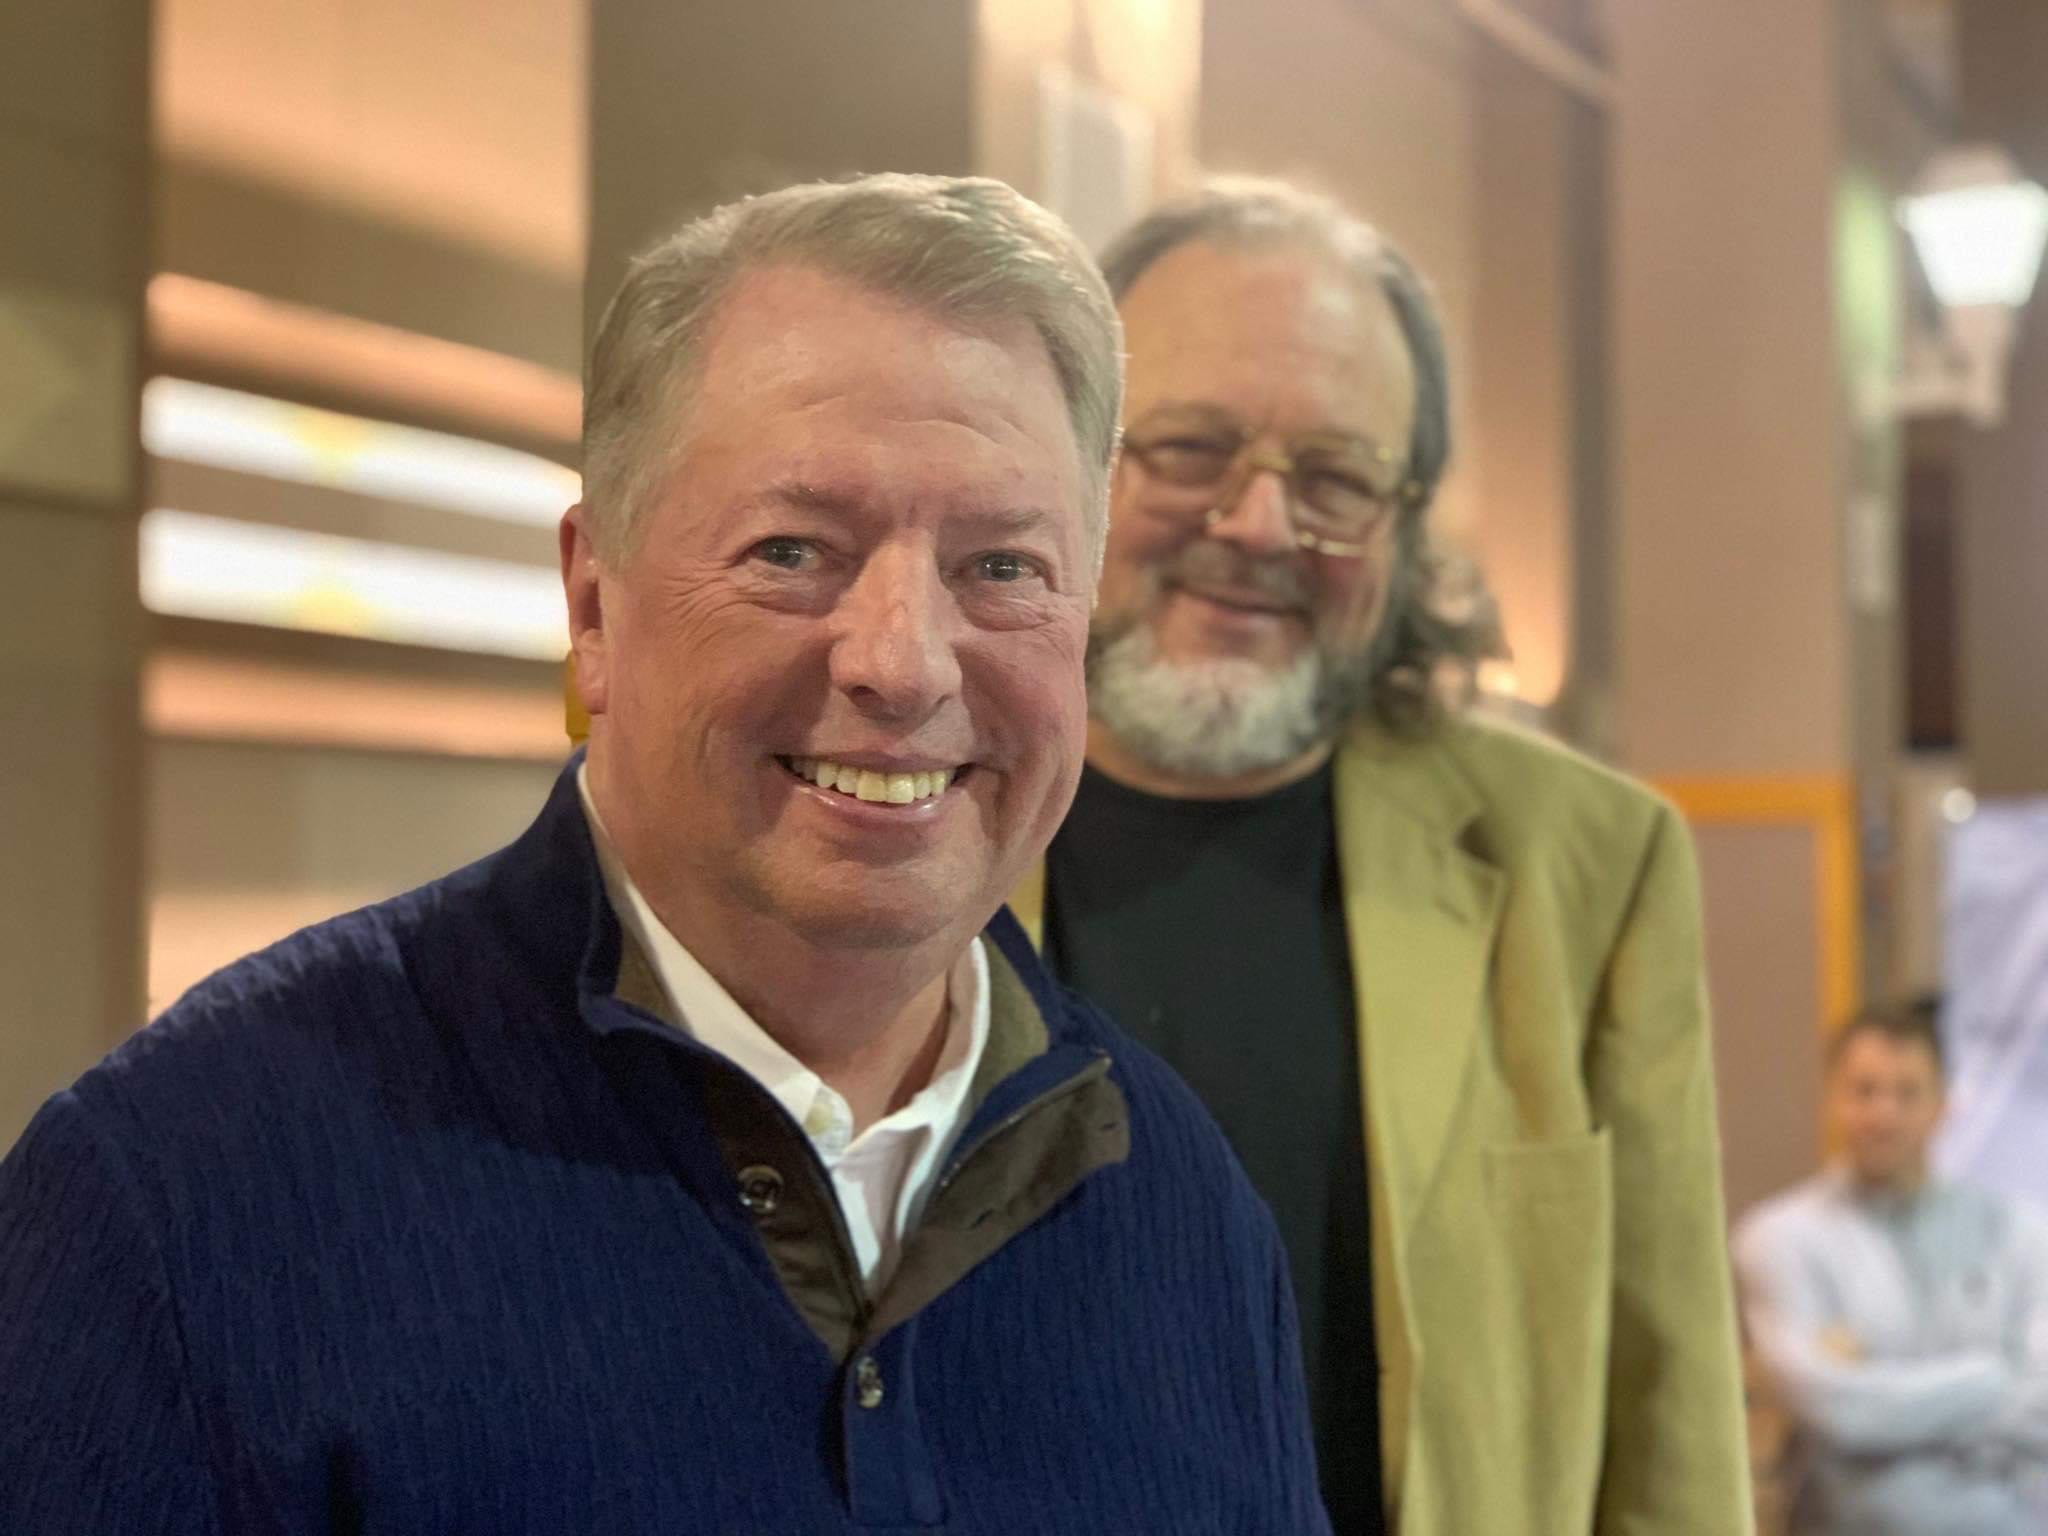 LISTEN: Thursday Night's, 'SportTalk' with Mark Tupper & Tim Cain